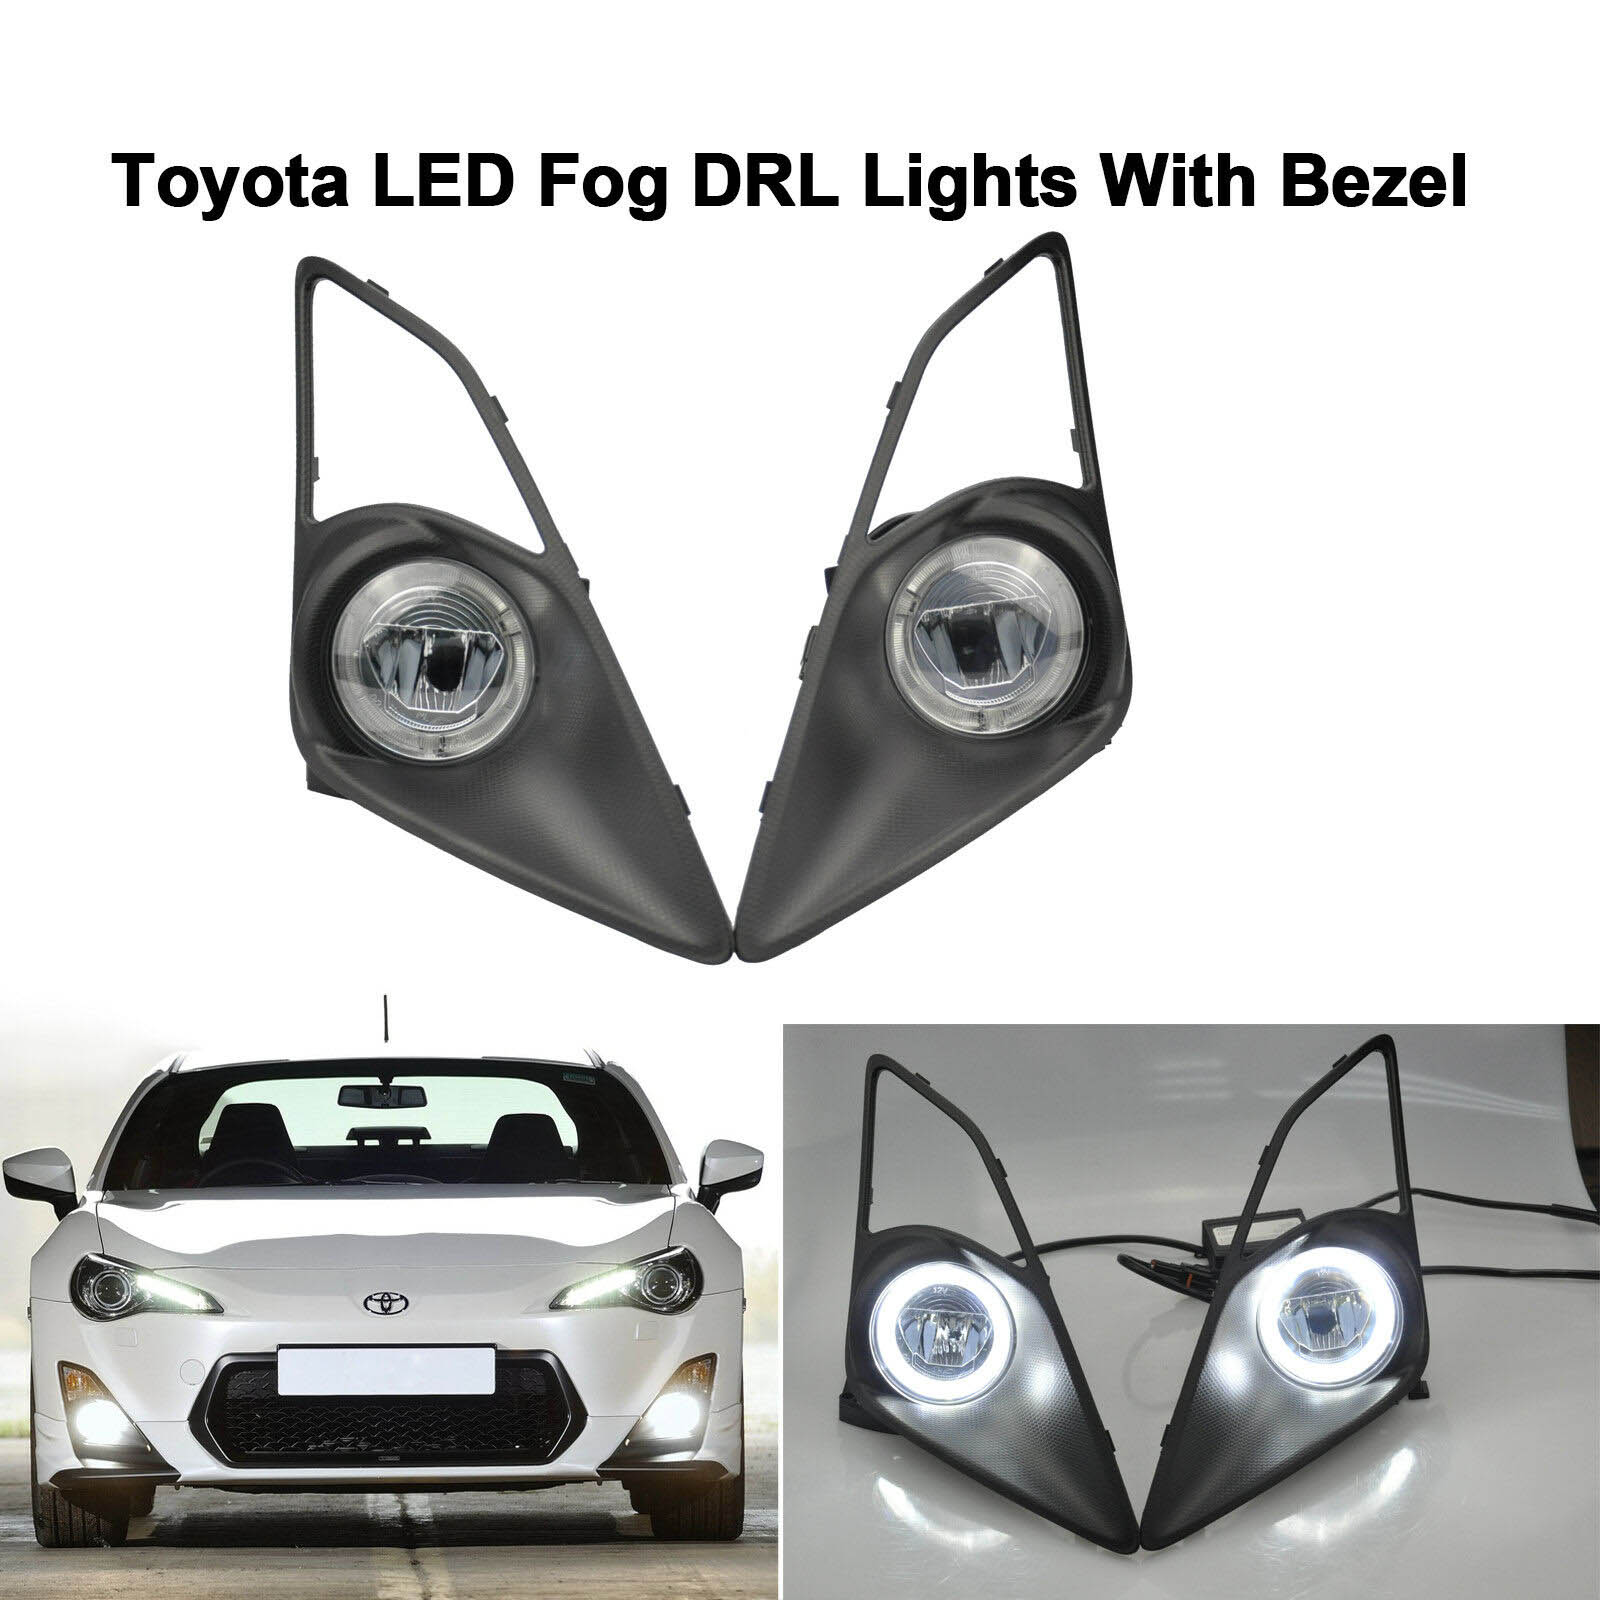 Anillo LED Halo luz antiniebla lámpara diurna DRL para Toyota GT86 Scion FR-S 2013-2016